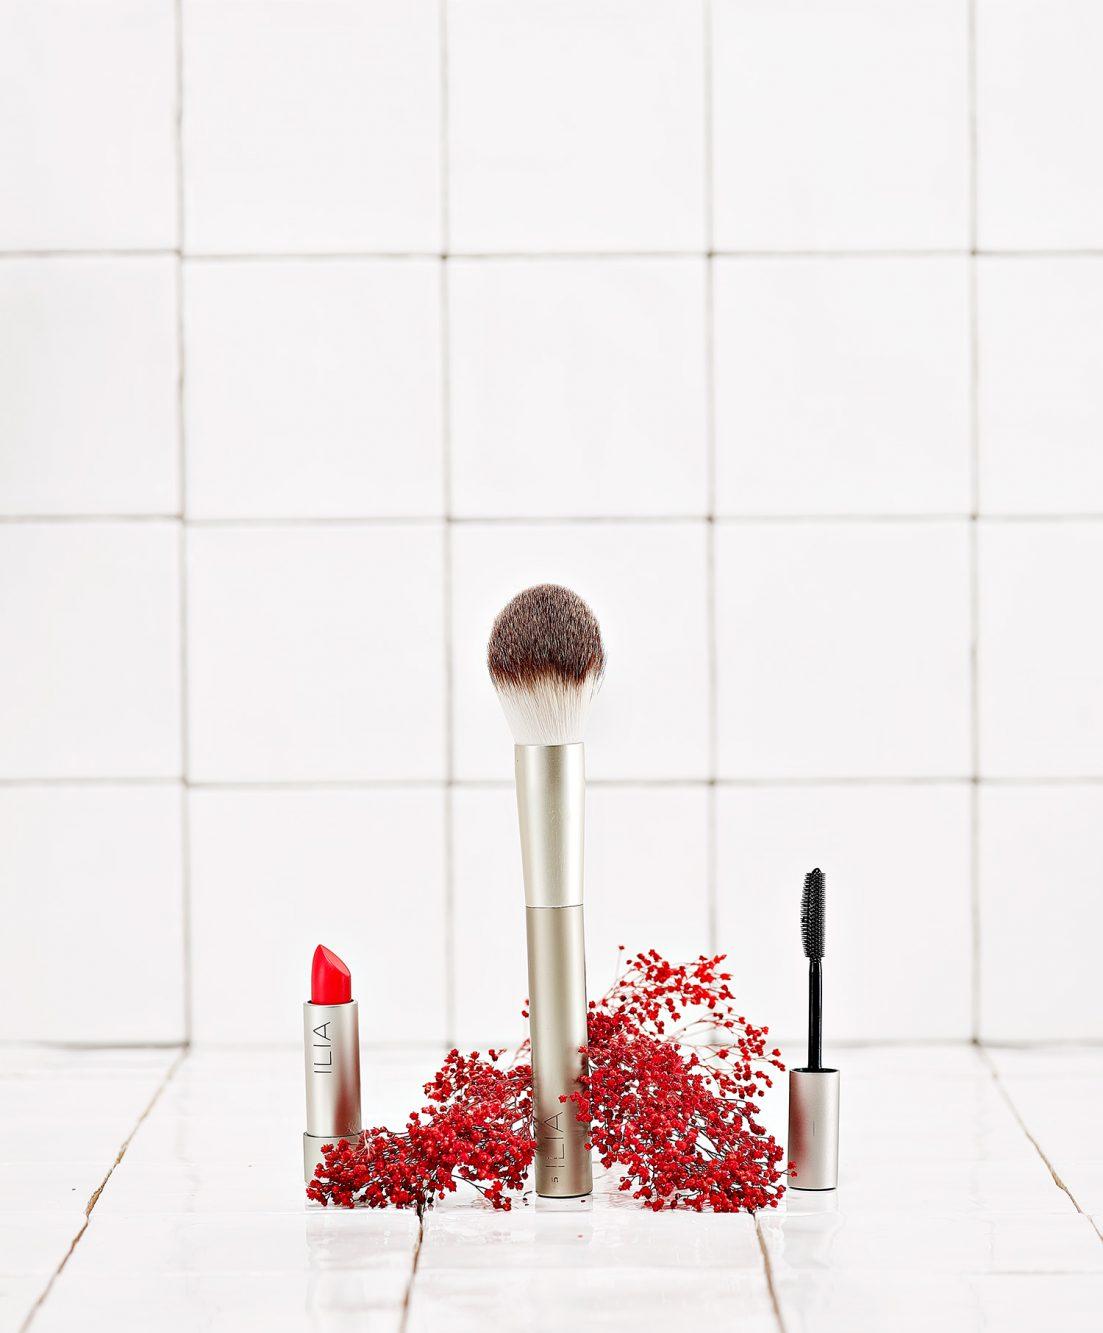 Maquillage - La Superbe Annecy